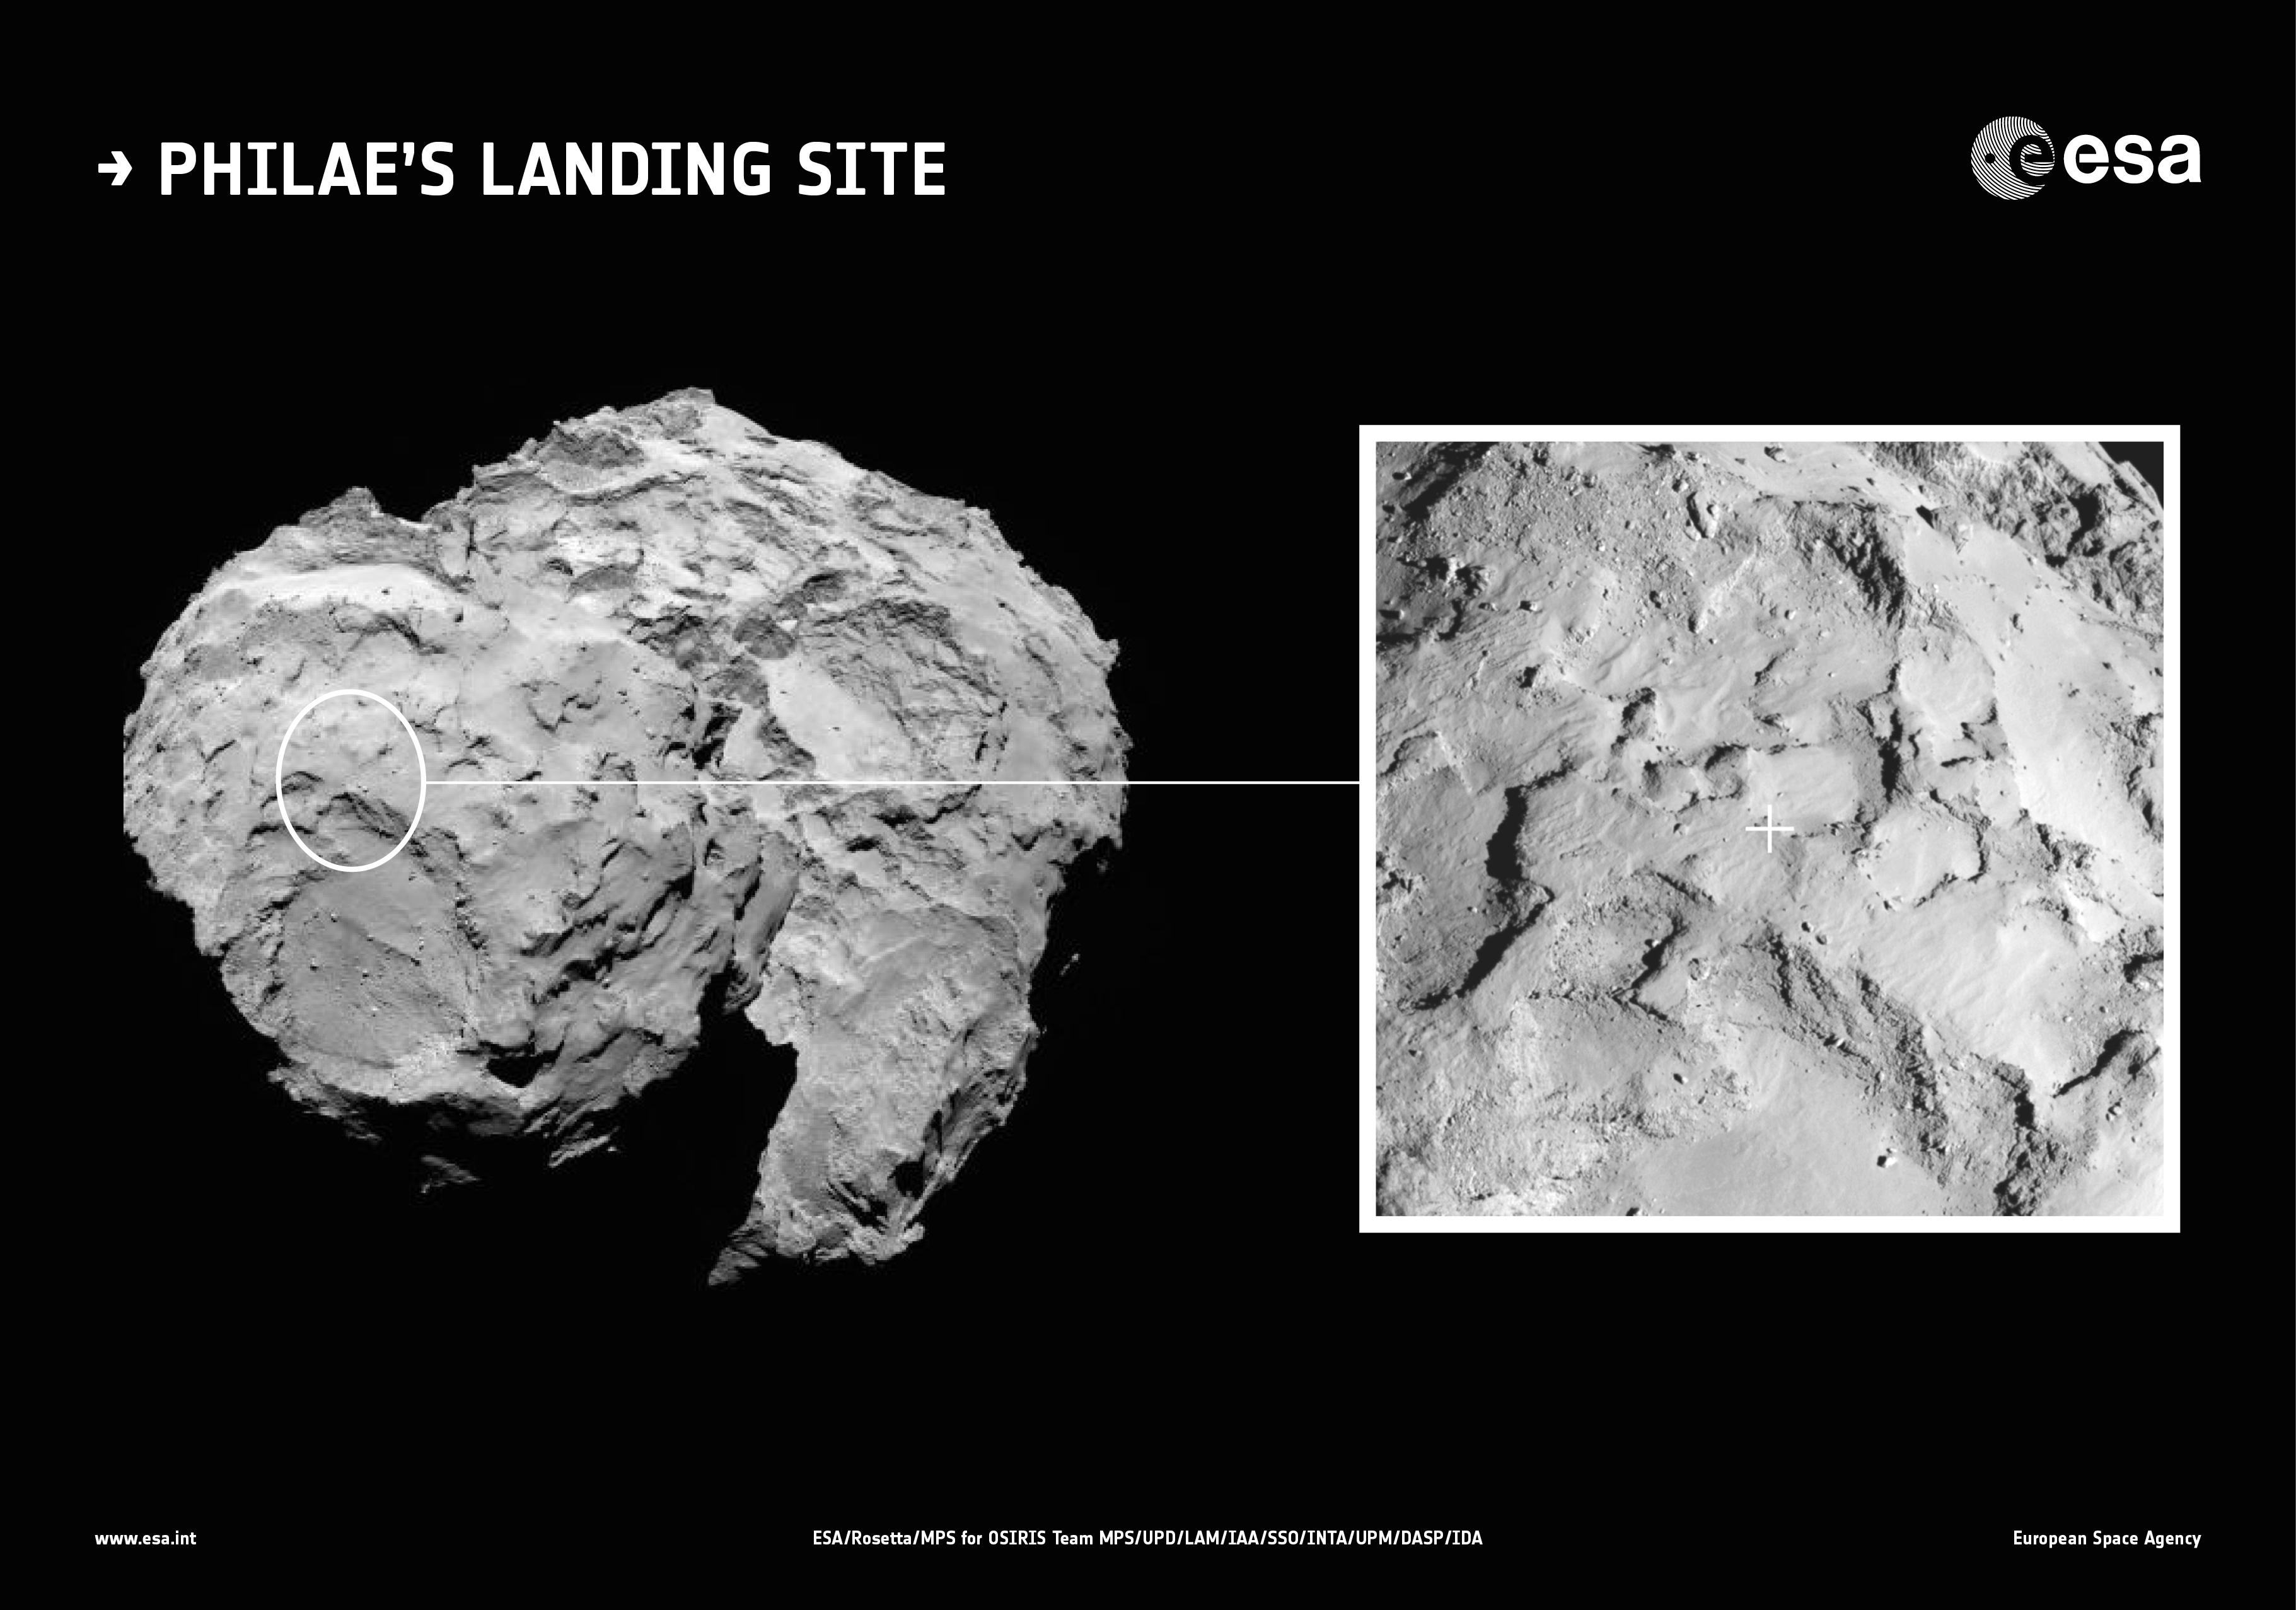 1567216352355-ESA_Rosetta_Philae_LandingSite_primary.jpg